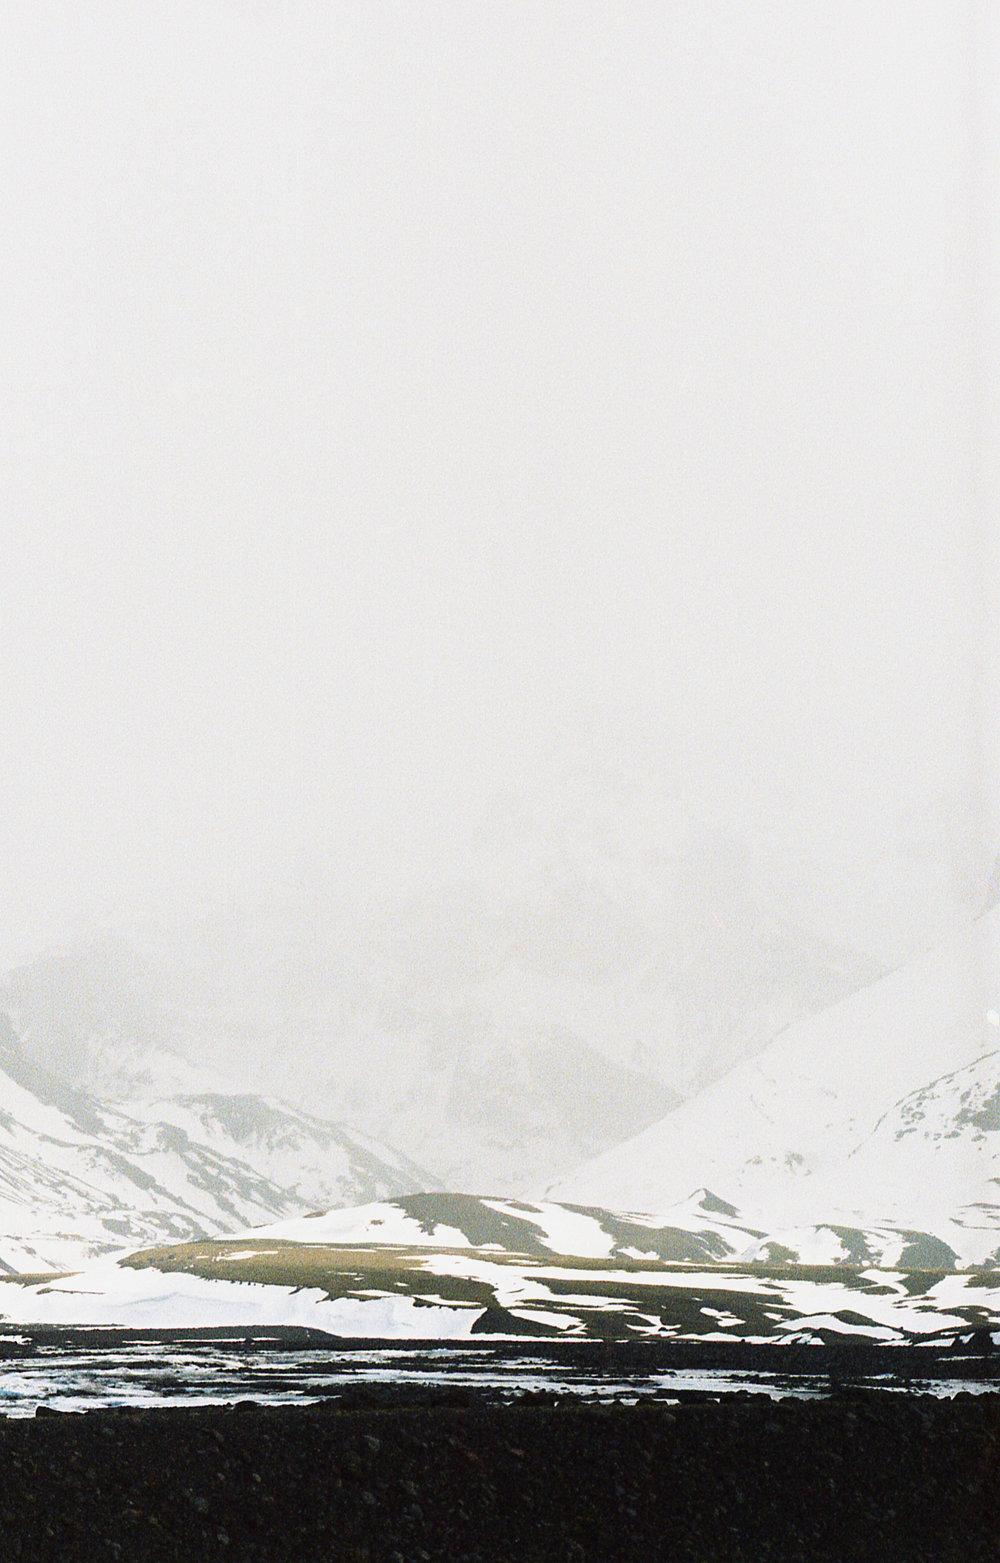 KK_icelandweb-248.jpg